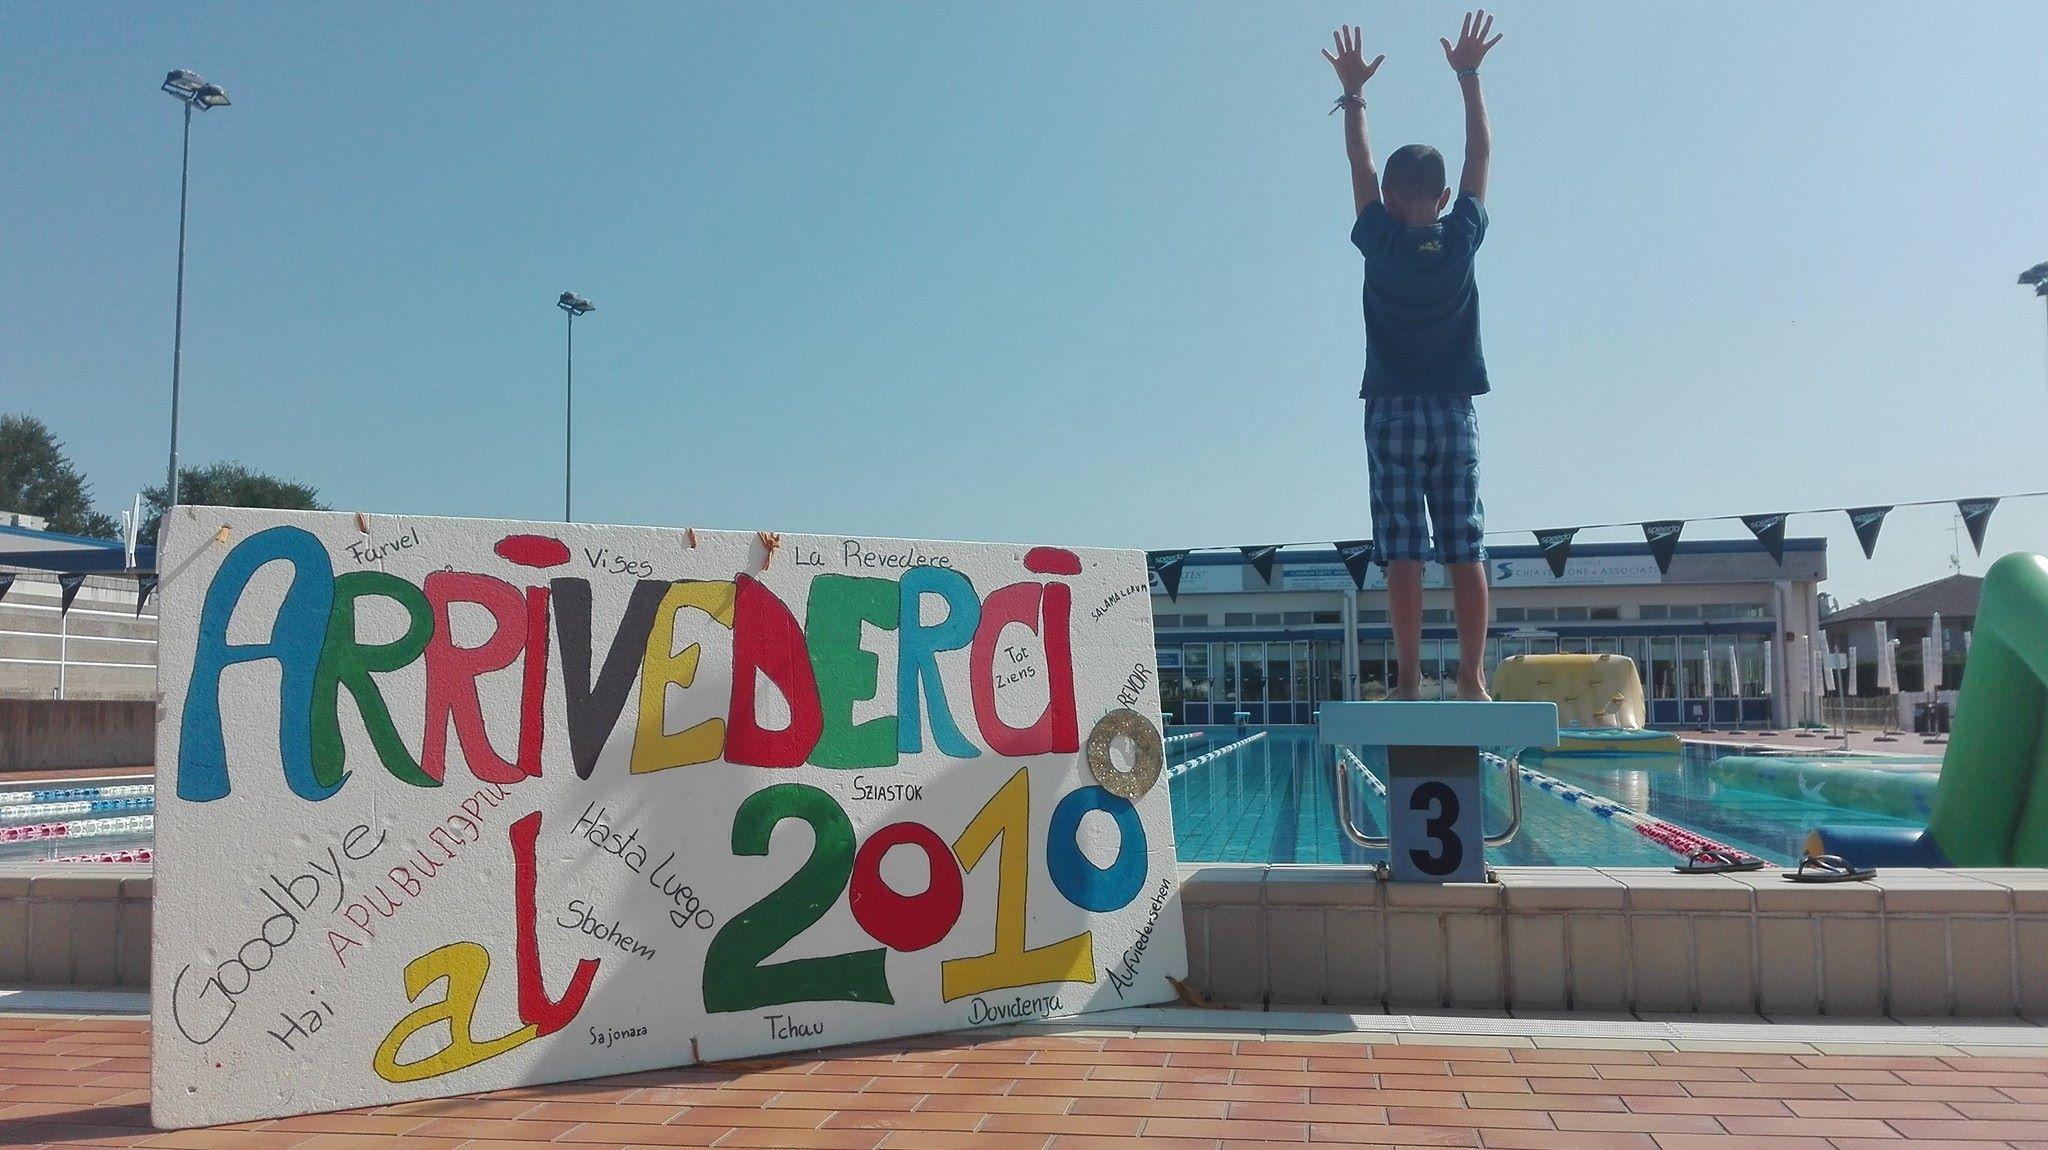 Piscina camping arrivederci al 2018 piscine montebelluna for Piscine 2018